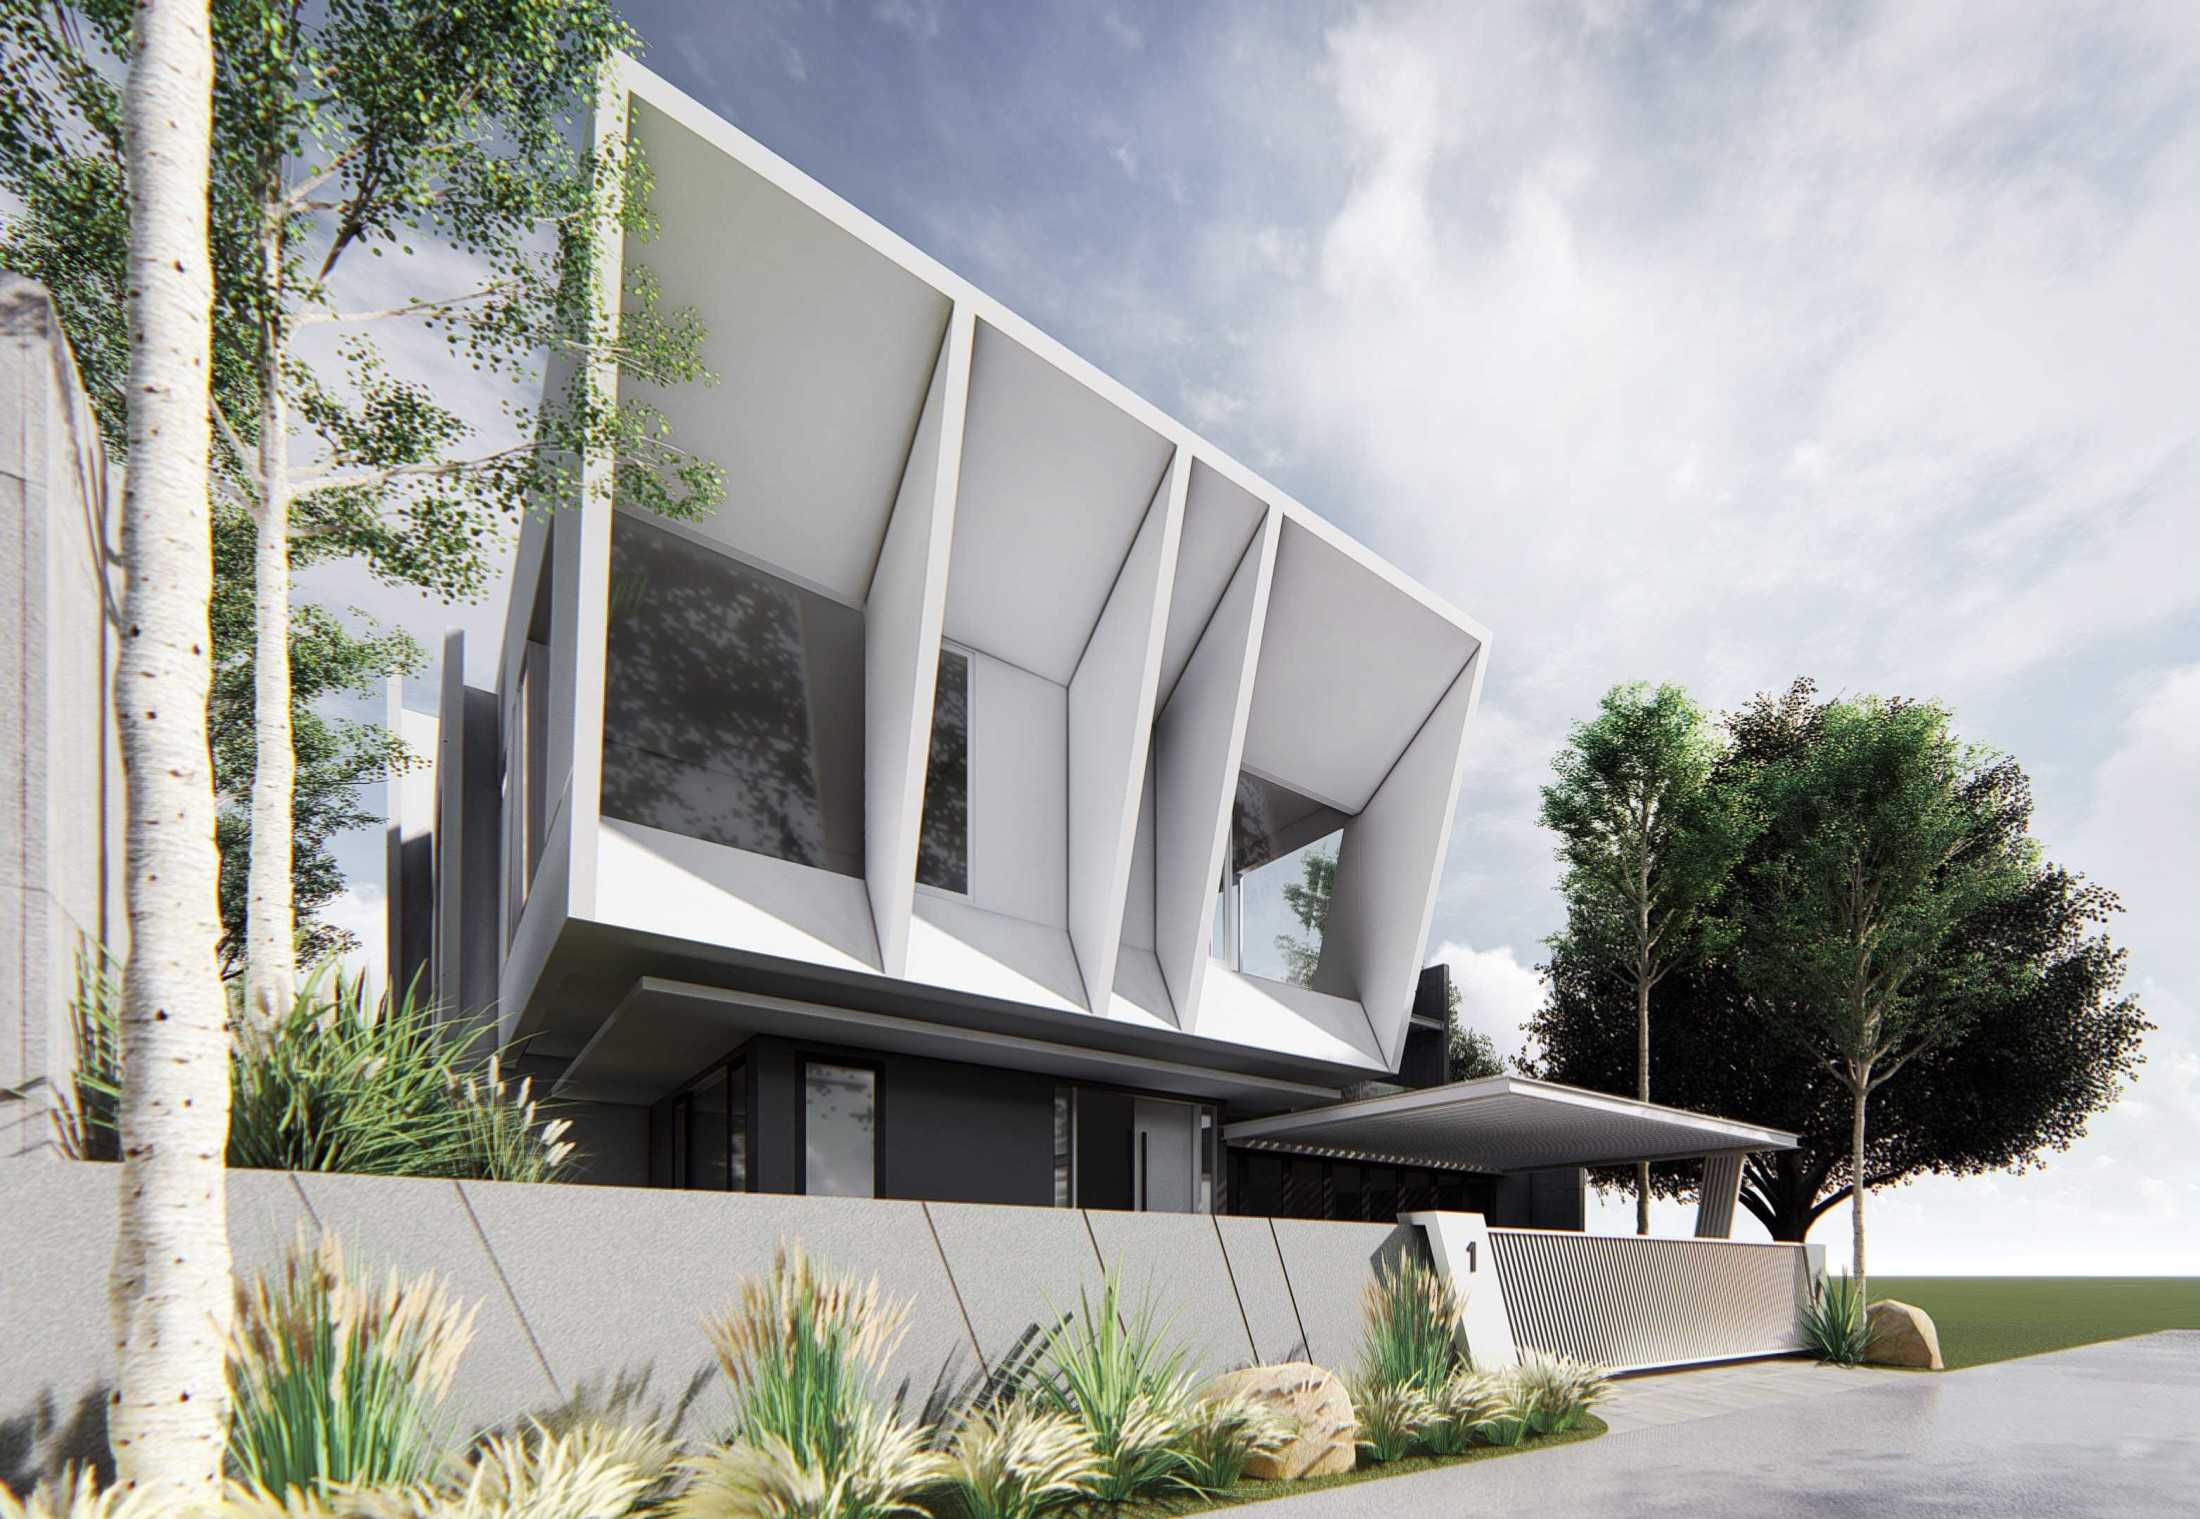 Mahastudio & Partner Italic House, Cibubur Jatisampurna, Kota Bks, Jawa Barat, Indonesia Jatisampurna, Kota Bks, Jawa Barat, Indonesia Mahastudio-Partner-Italic-House-Cibubur Modern 65448